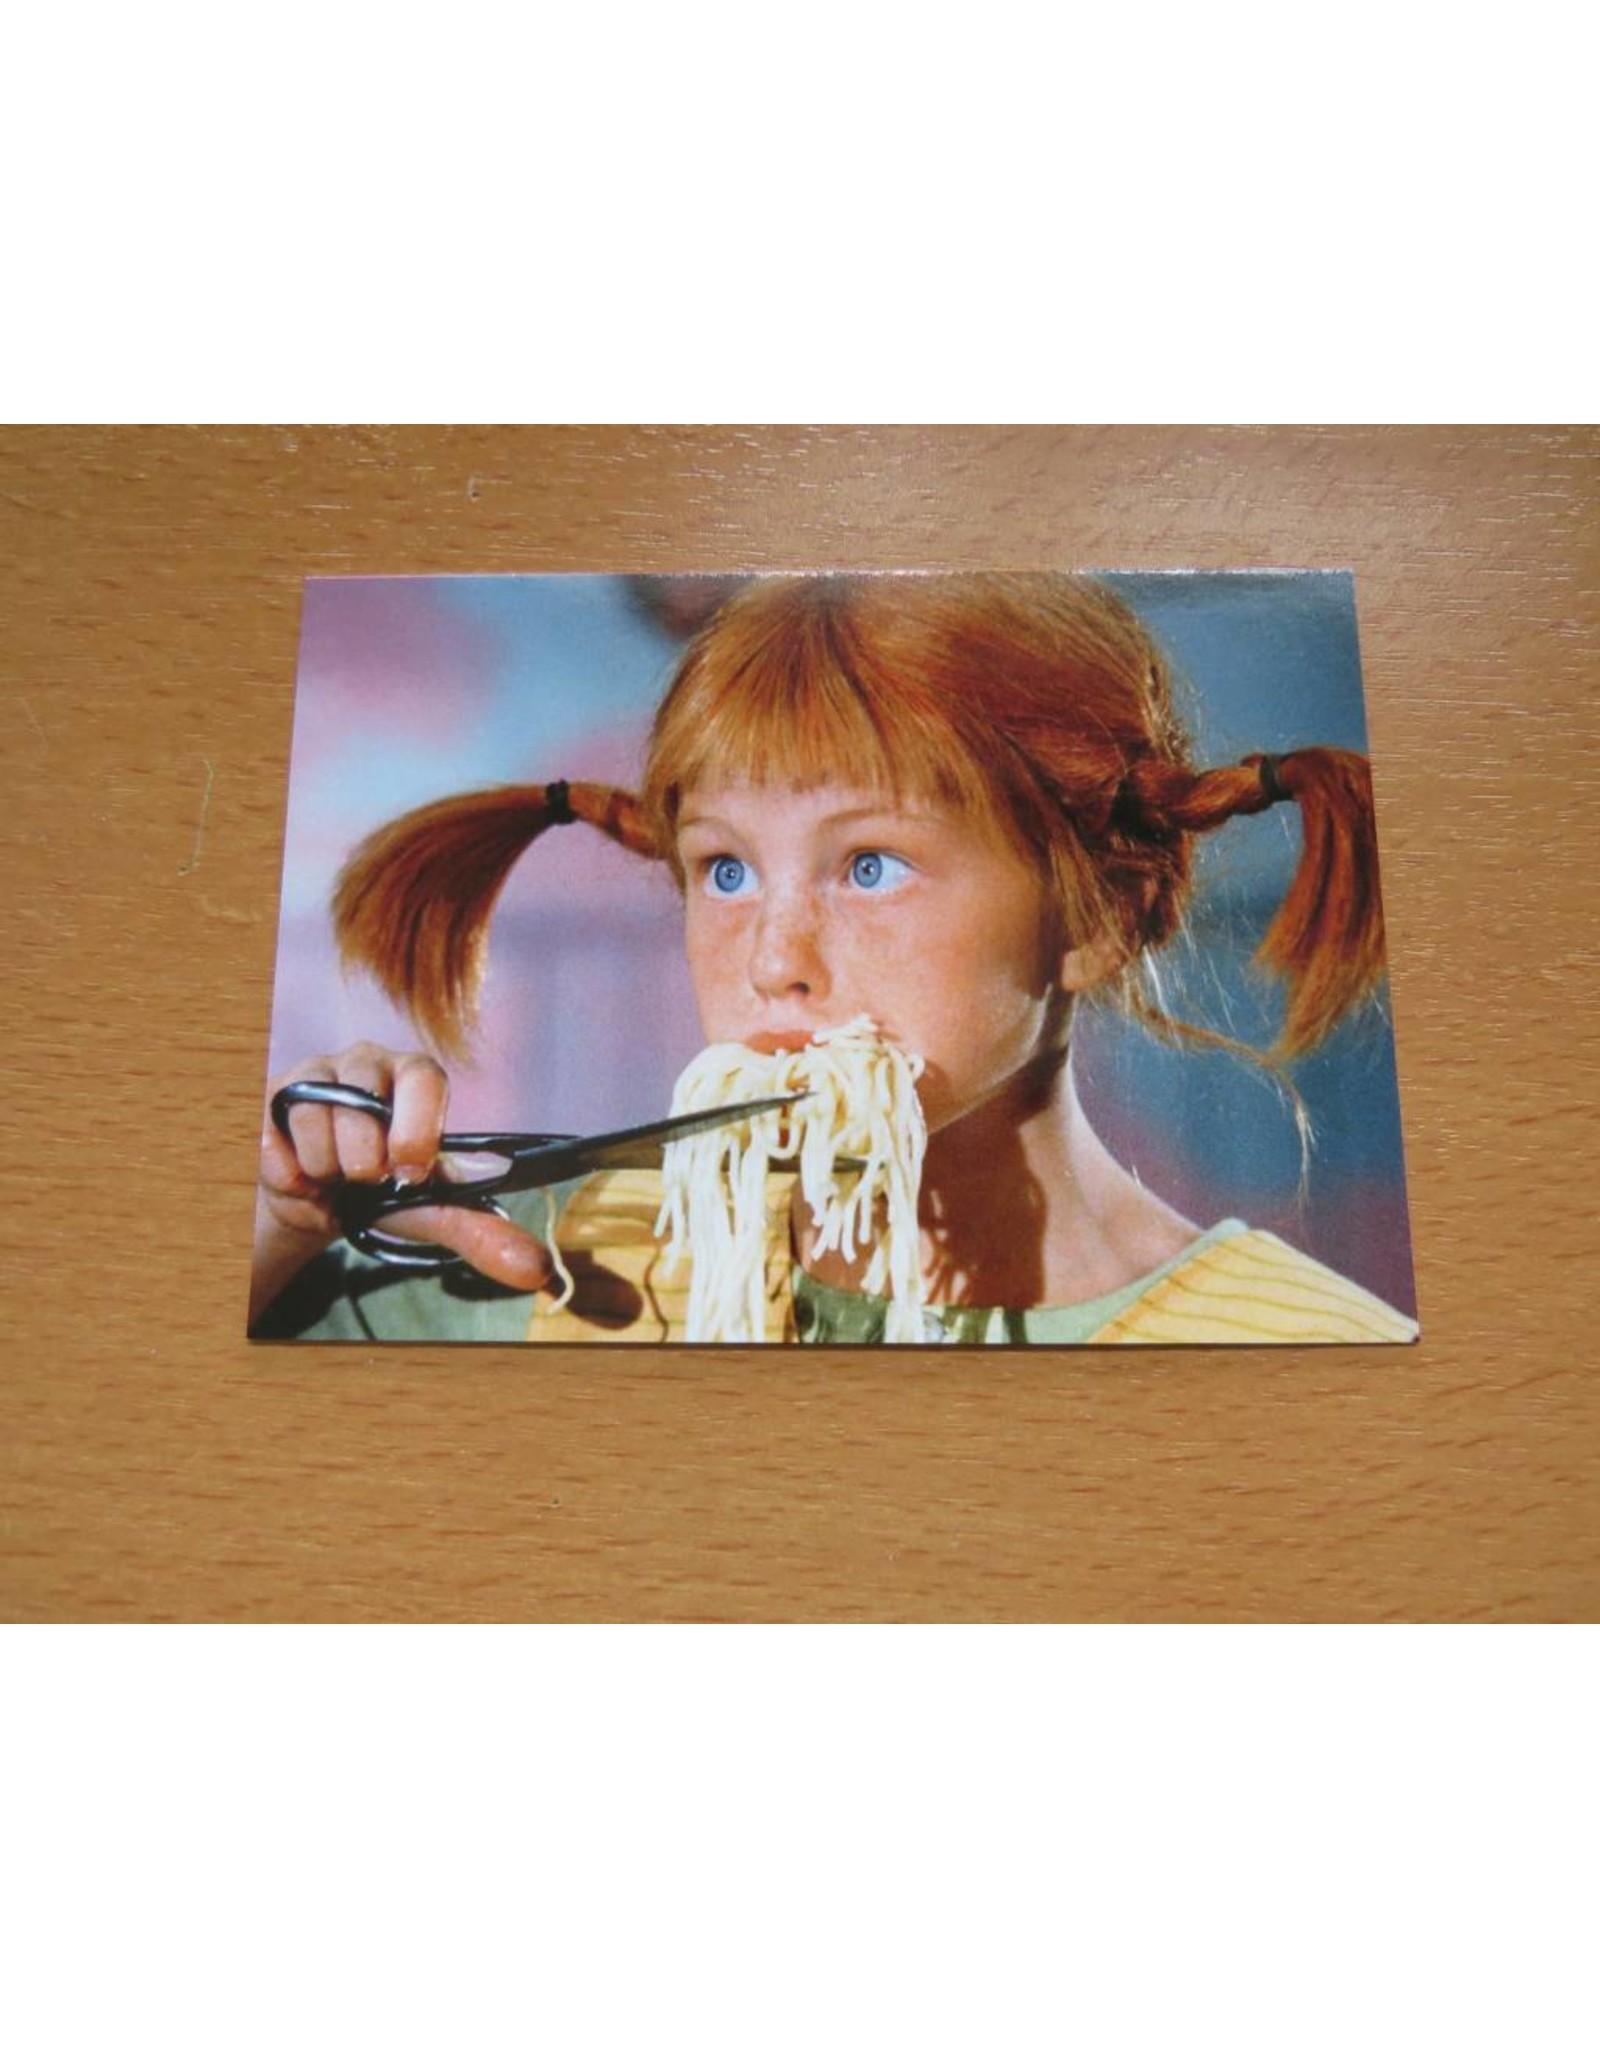 Pippi Langkous Pippi Longstocking card - Spaghetti